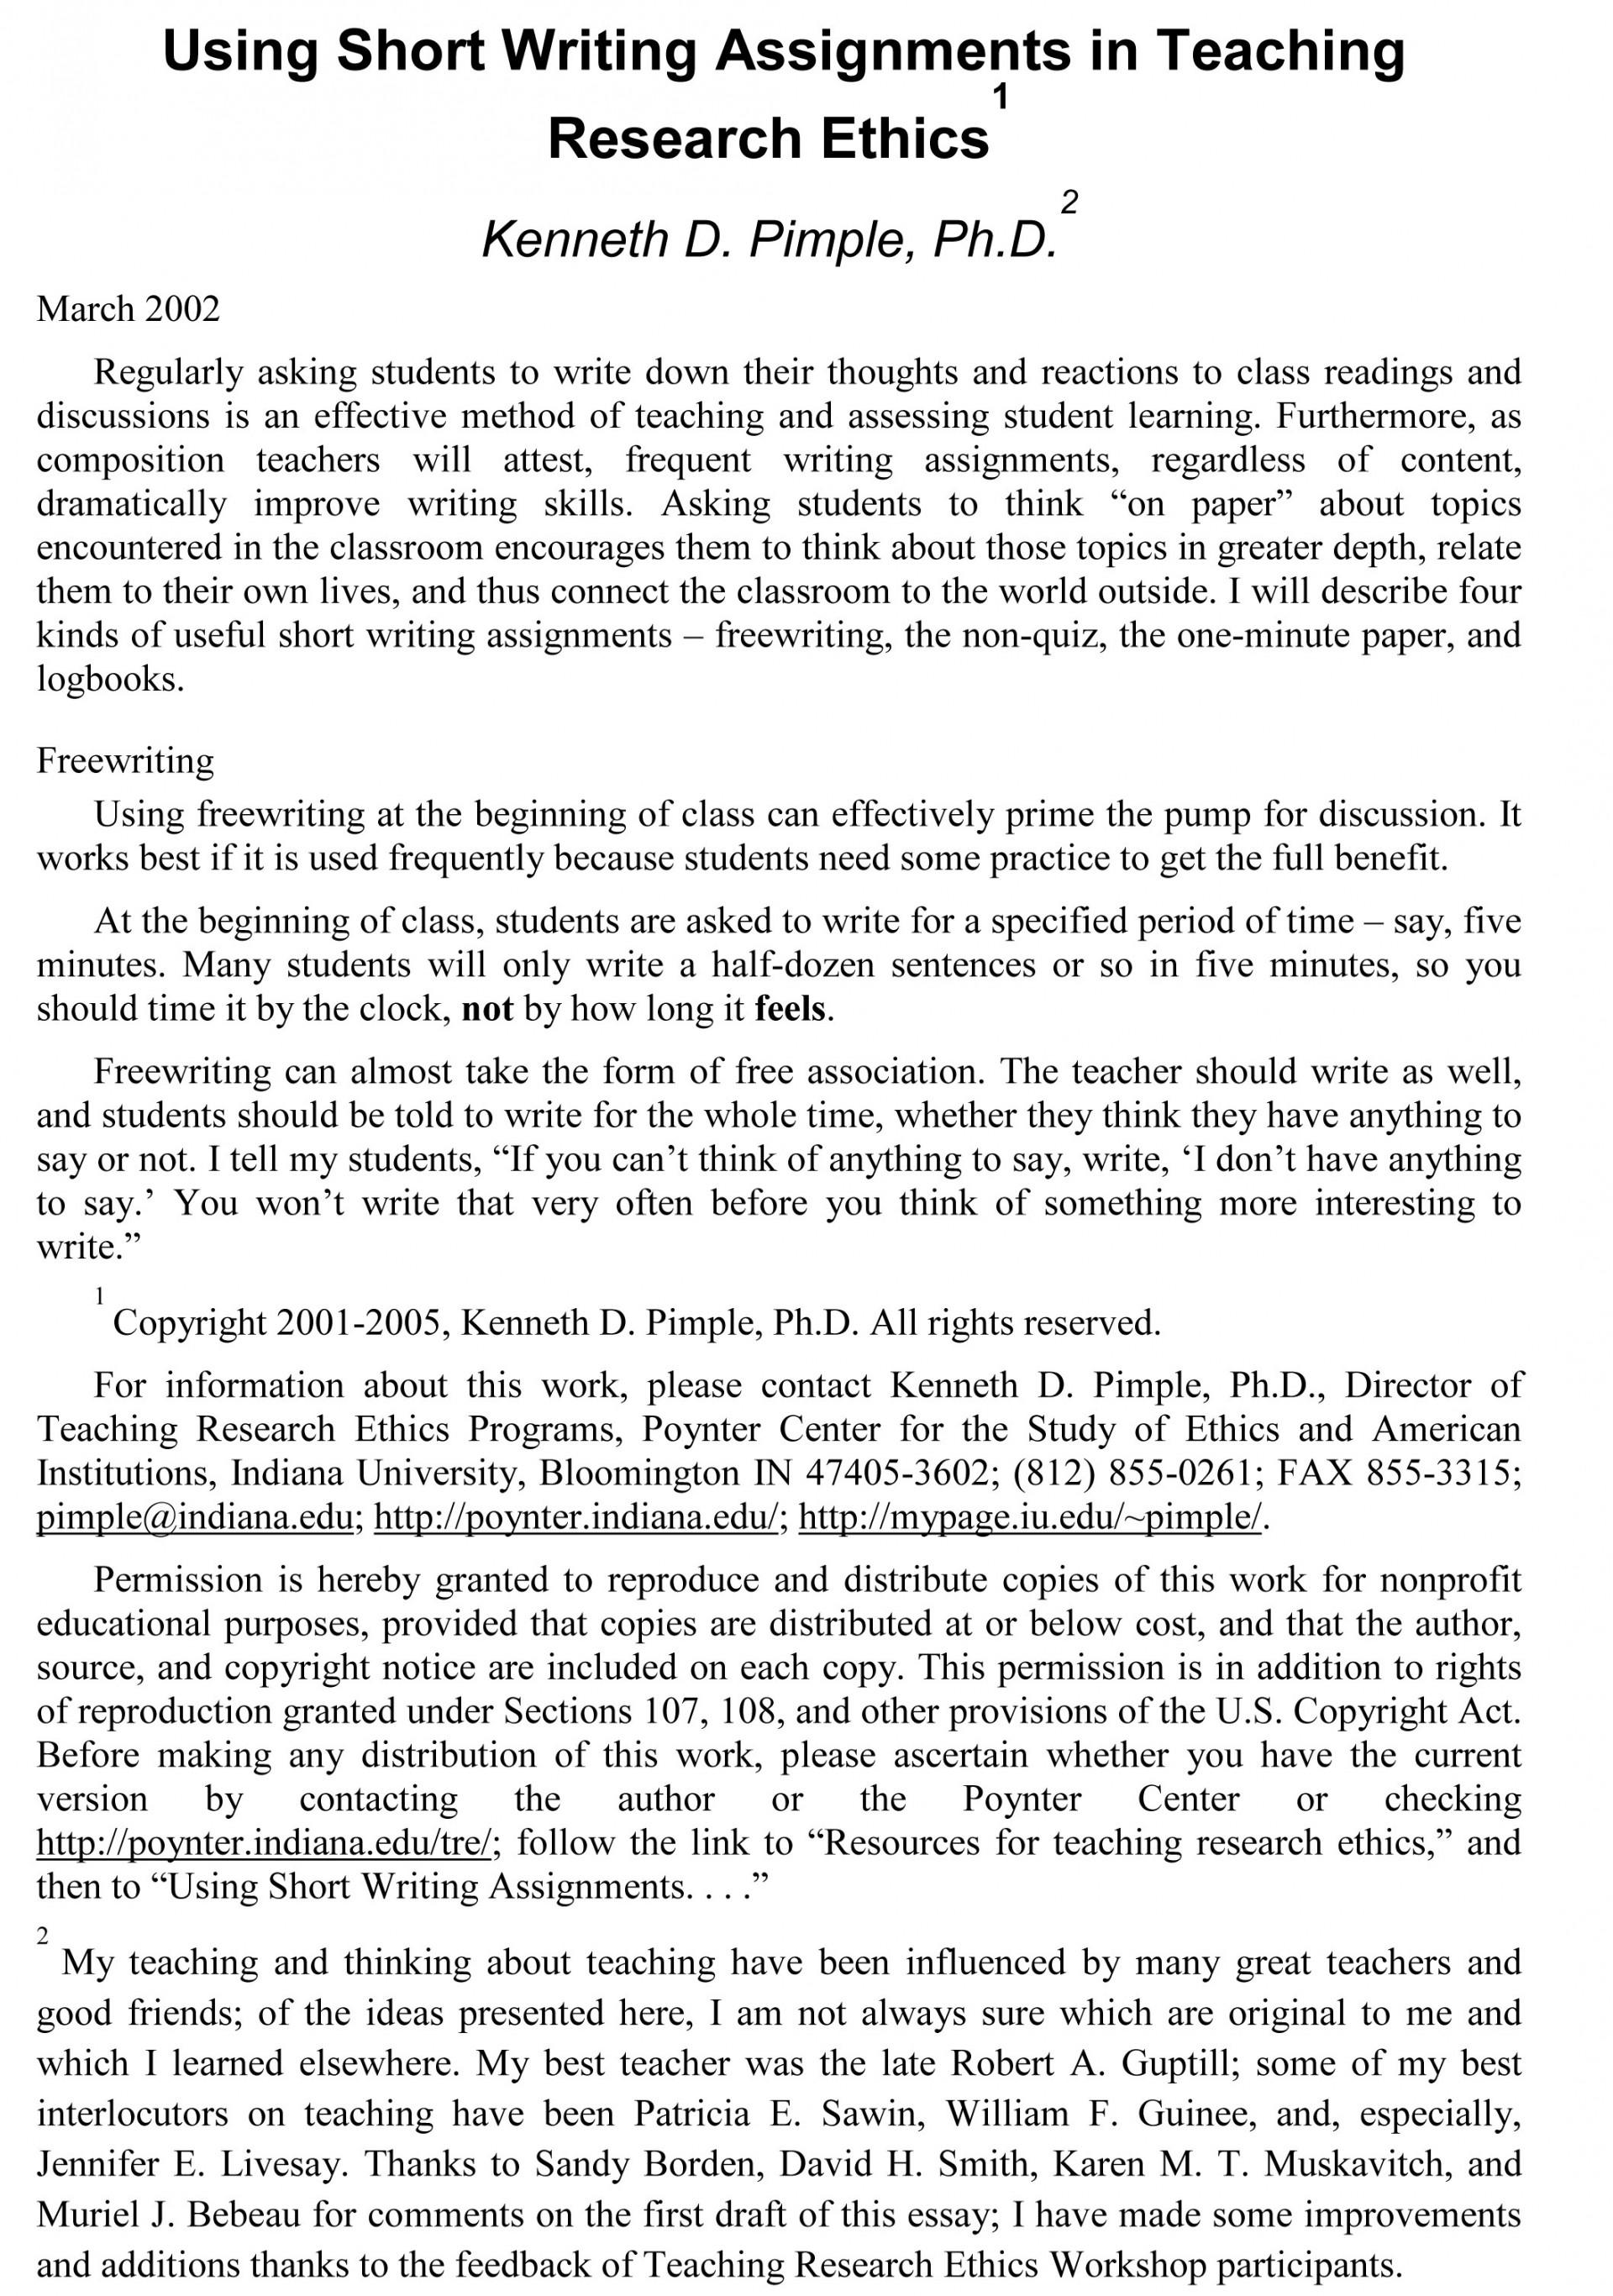 012 Essay Example Diversity Sample Fascinating Law School 1920